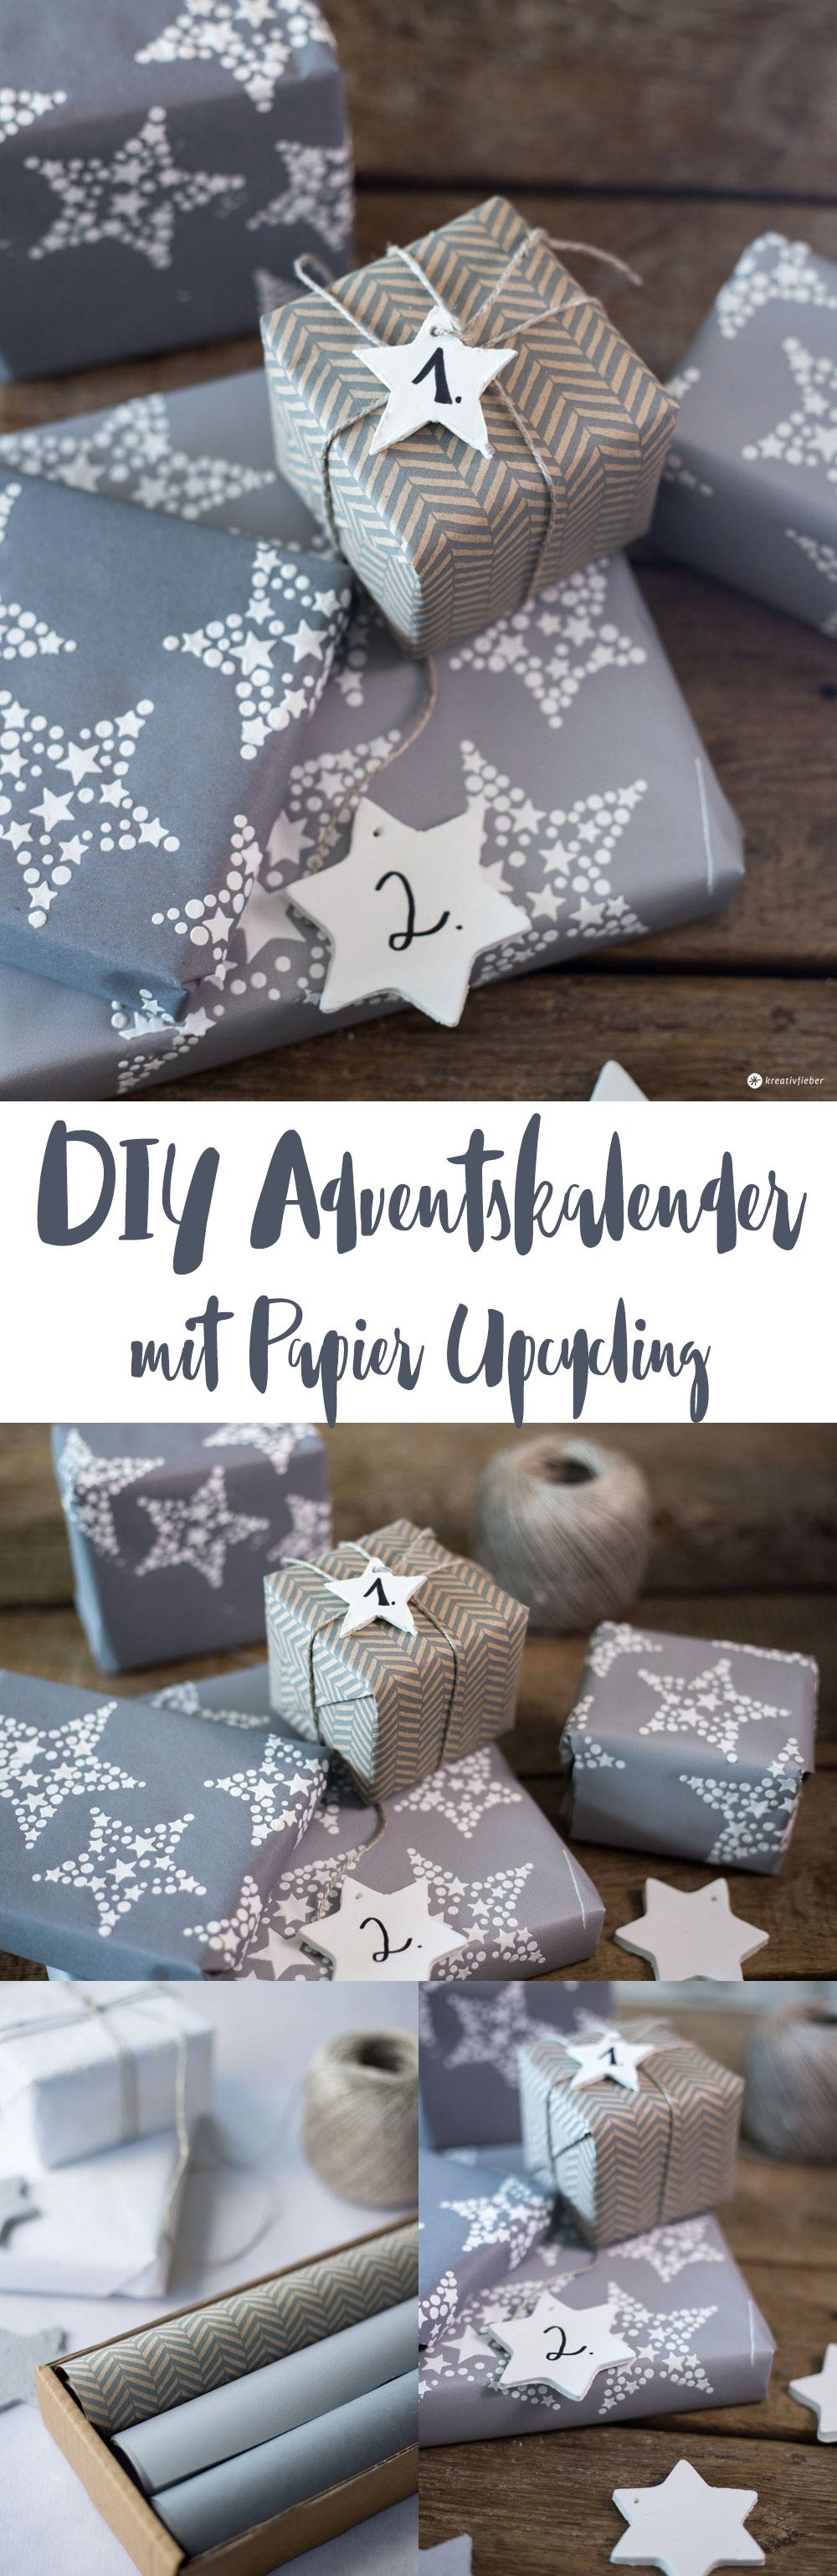 DIY Adventskalender Verpackung Papier Upcycling